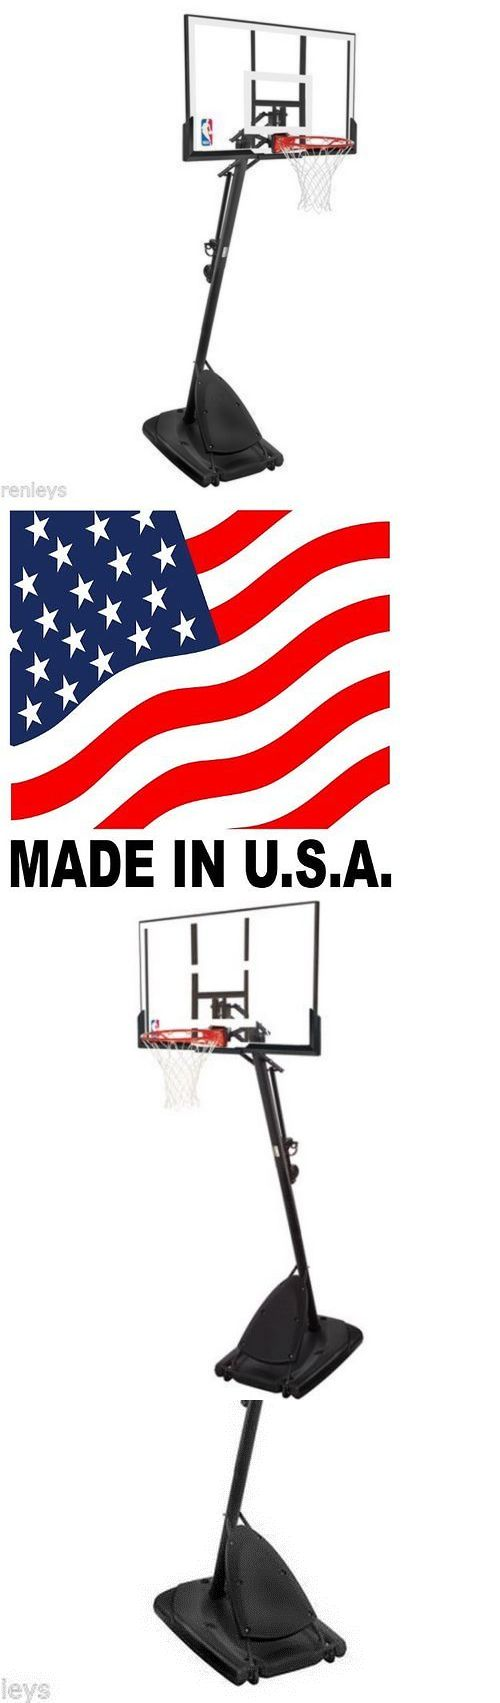 Backboard Systems 21196: Polycarbonate Basketball System Spalding 54 Adjustable Hoop Backboard Net Pole -> BUY IT NOW ONLY: $245.98 on eBay!